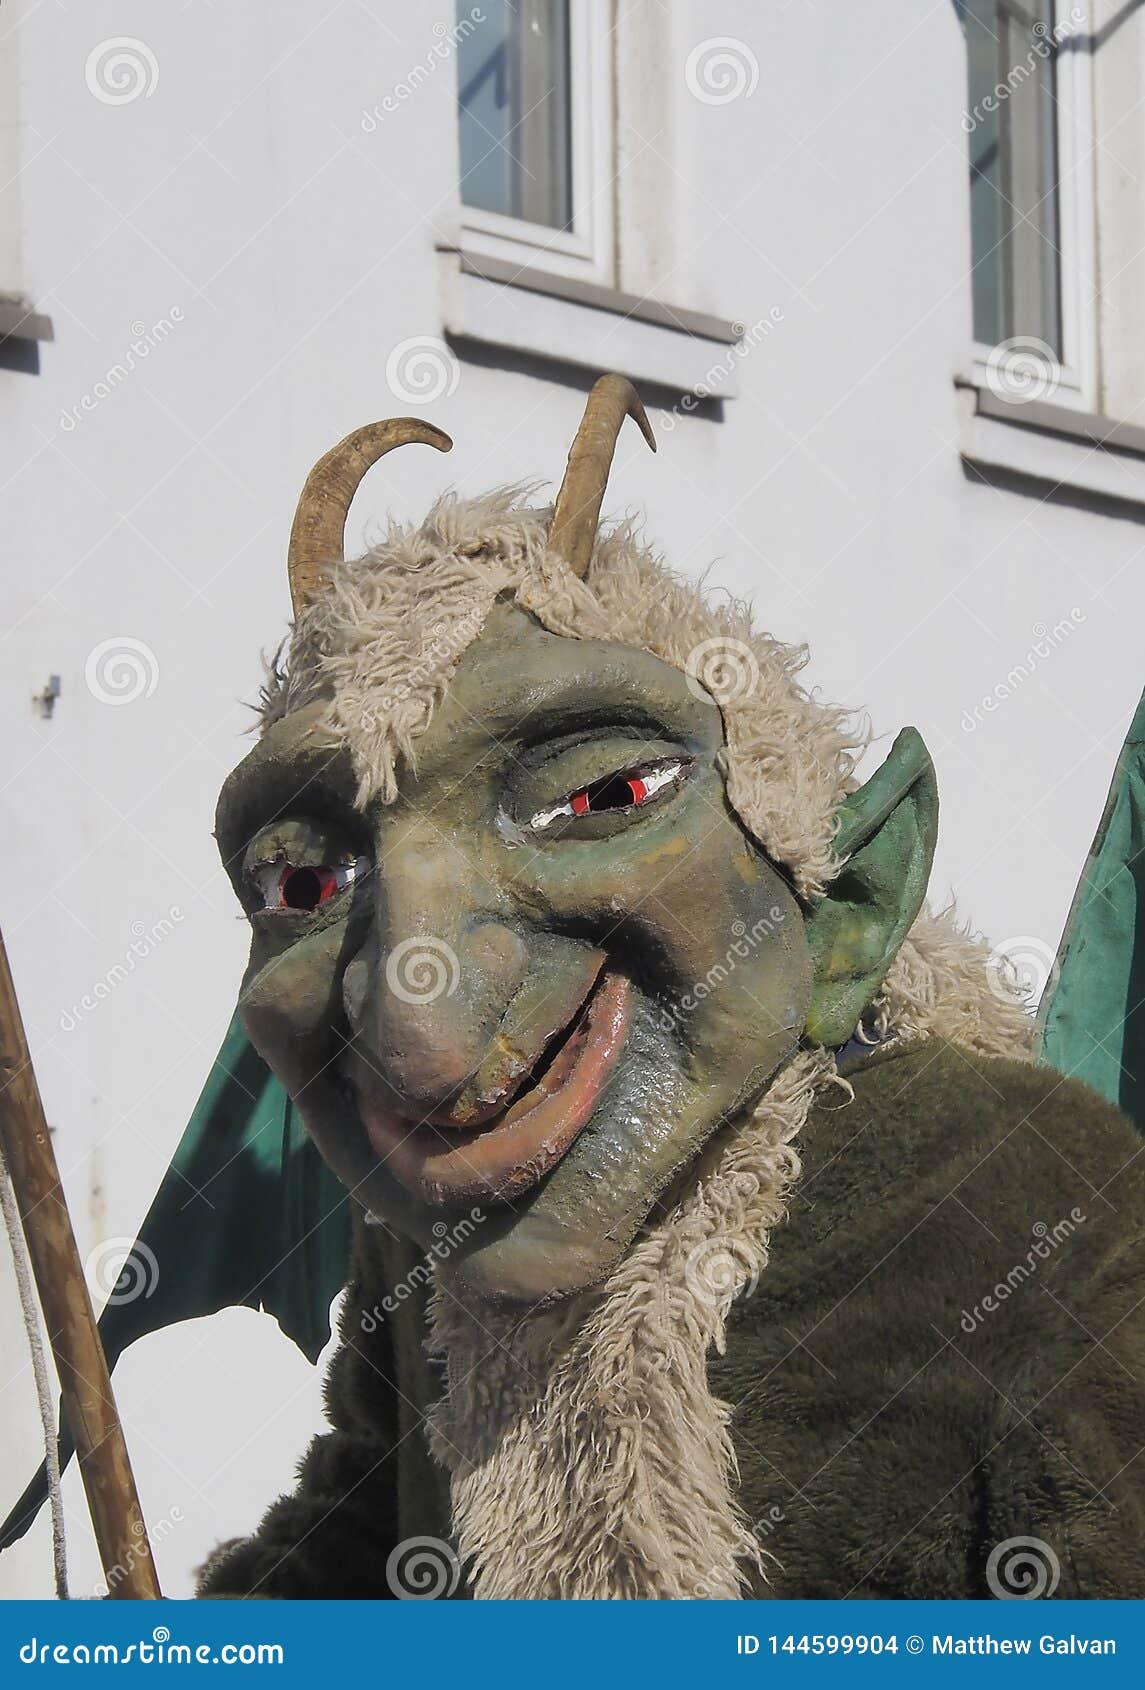 Demon Costume close up